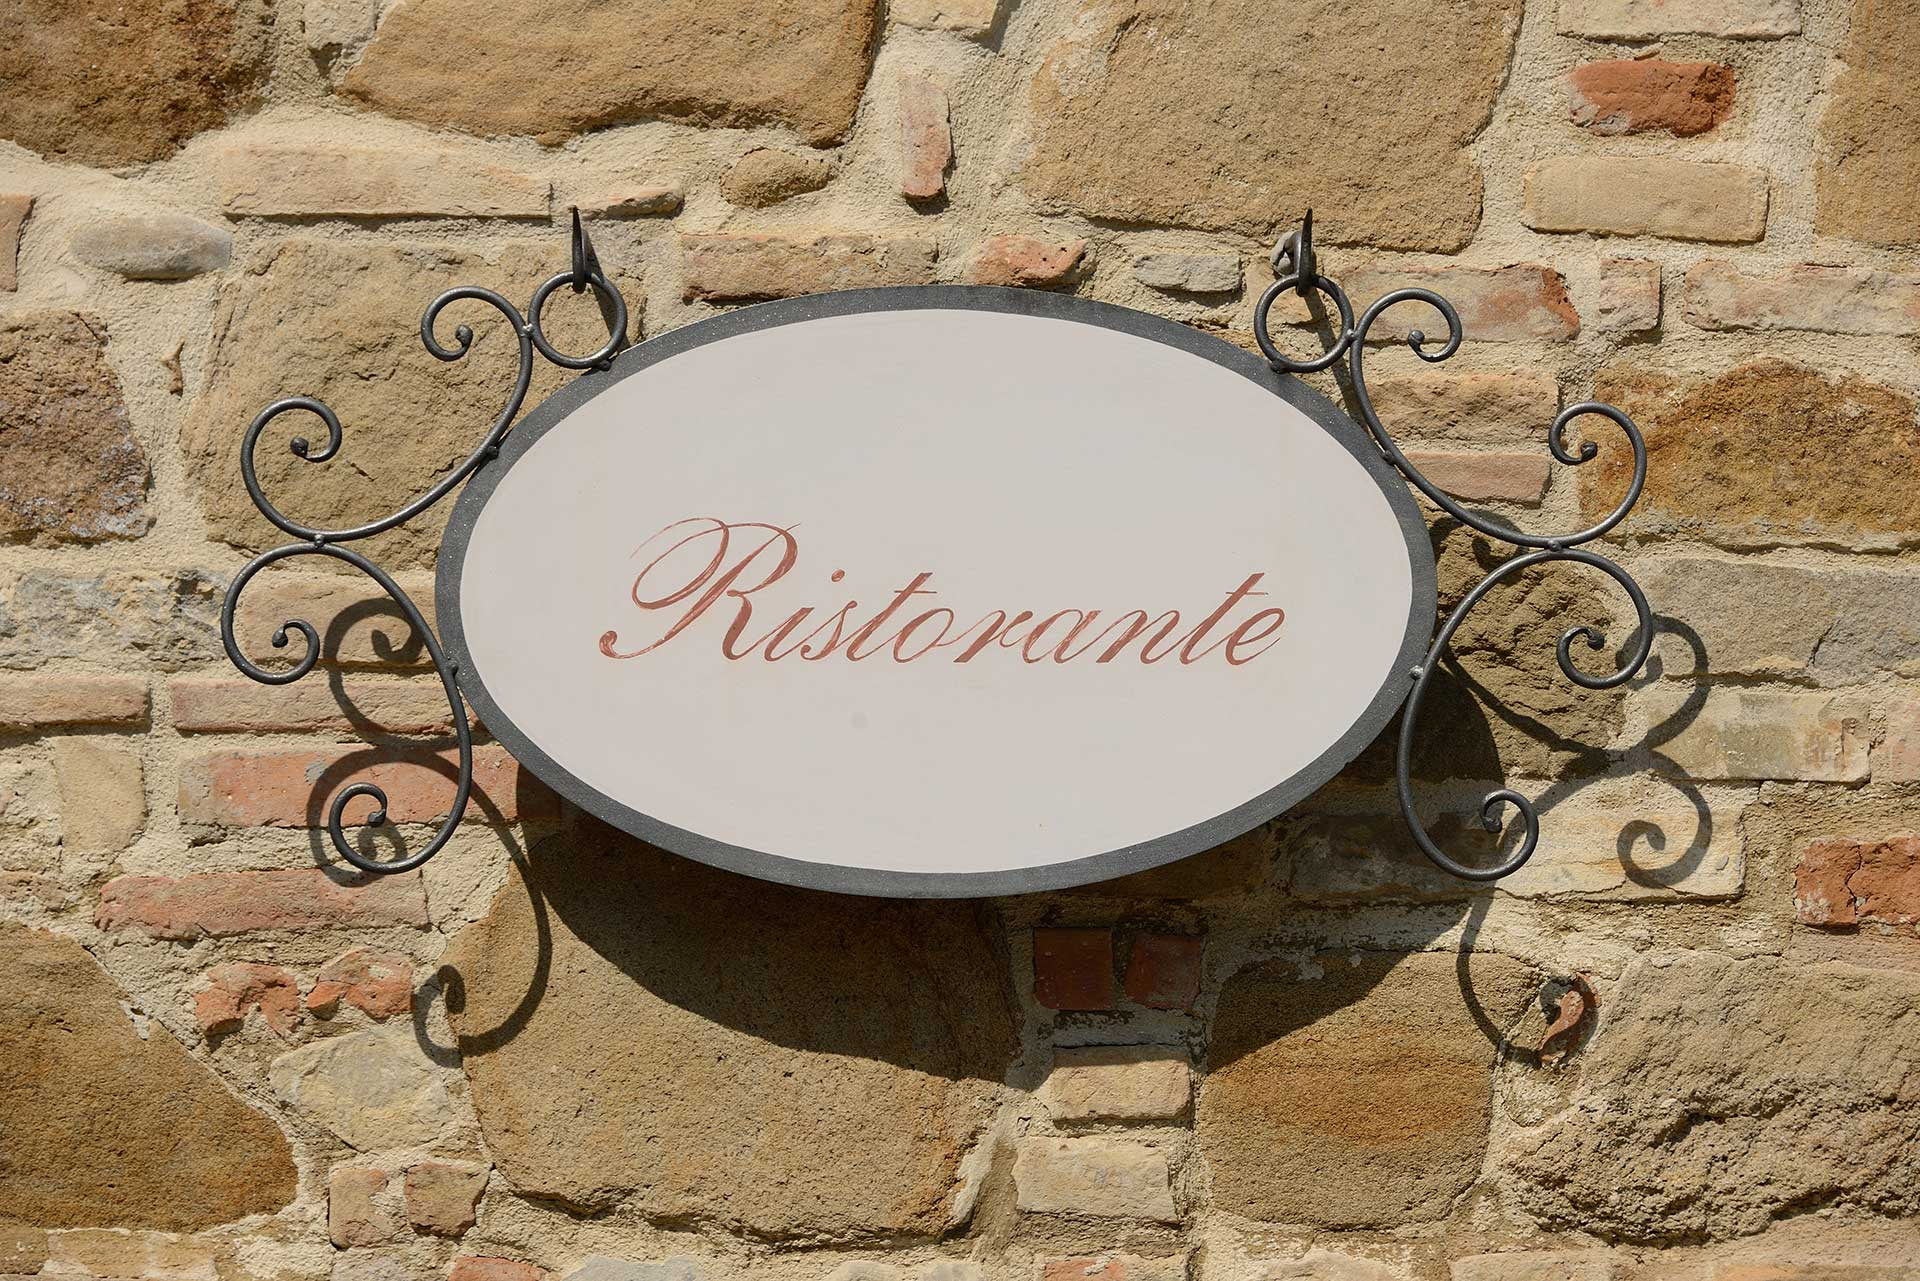 ristorante perugia